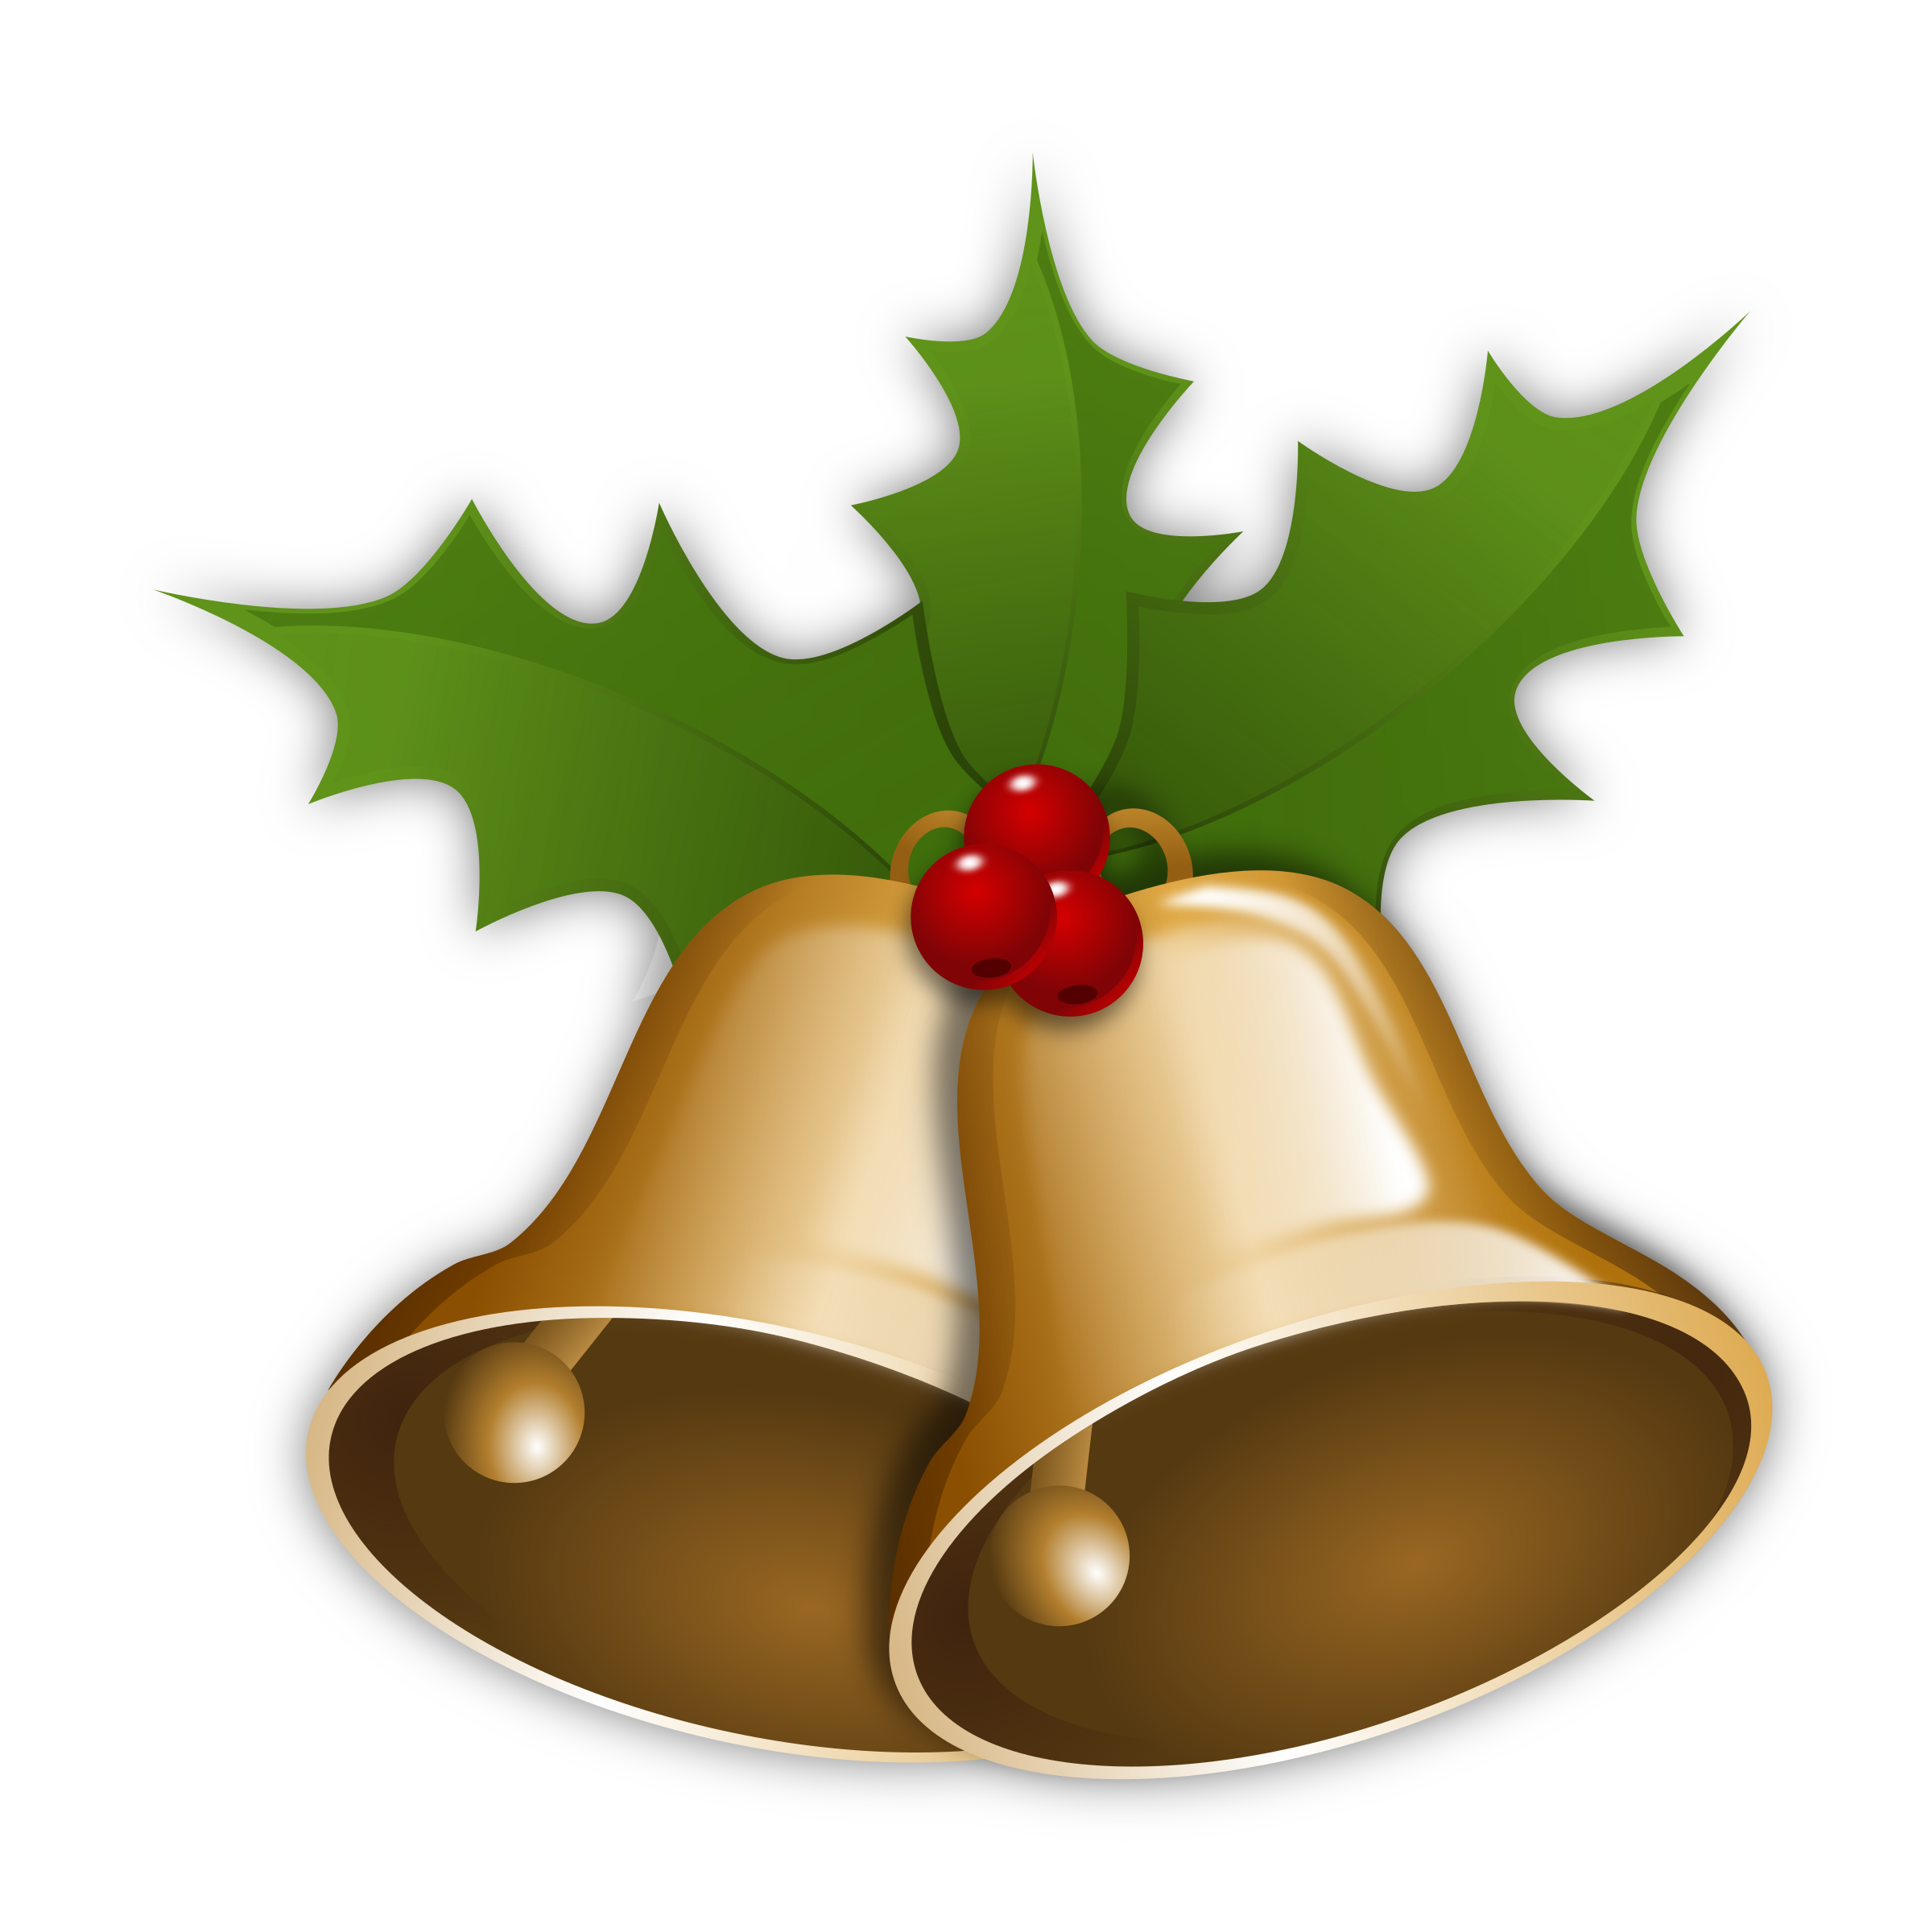 Free Christmas Bells Clip Art, Download Free Clip Art, Free.